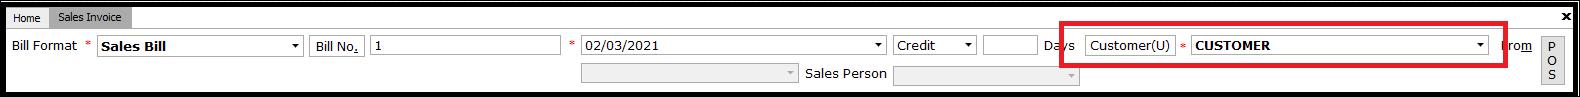 Sales invoice customer